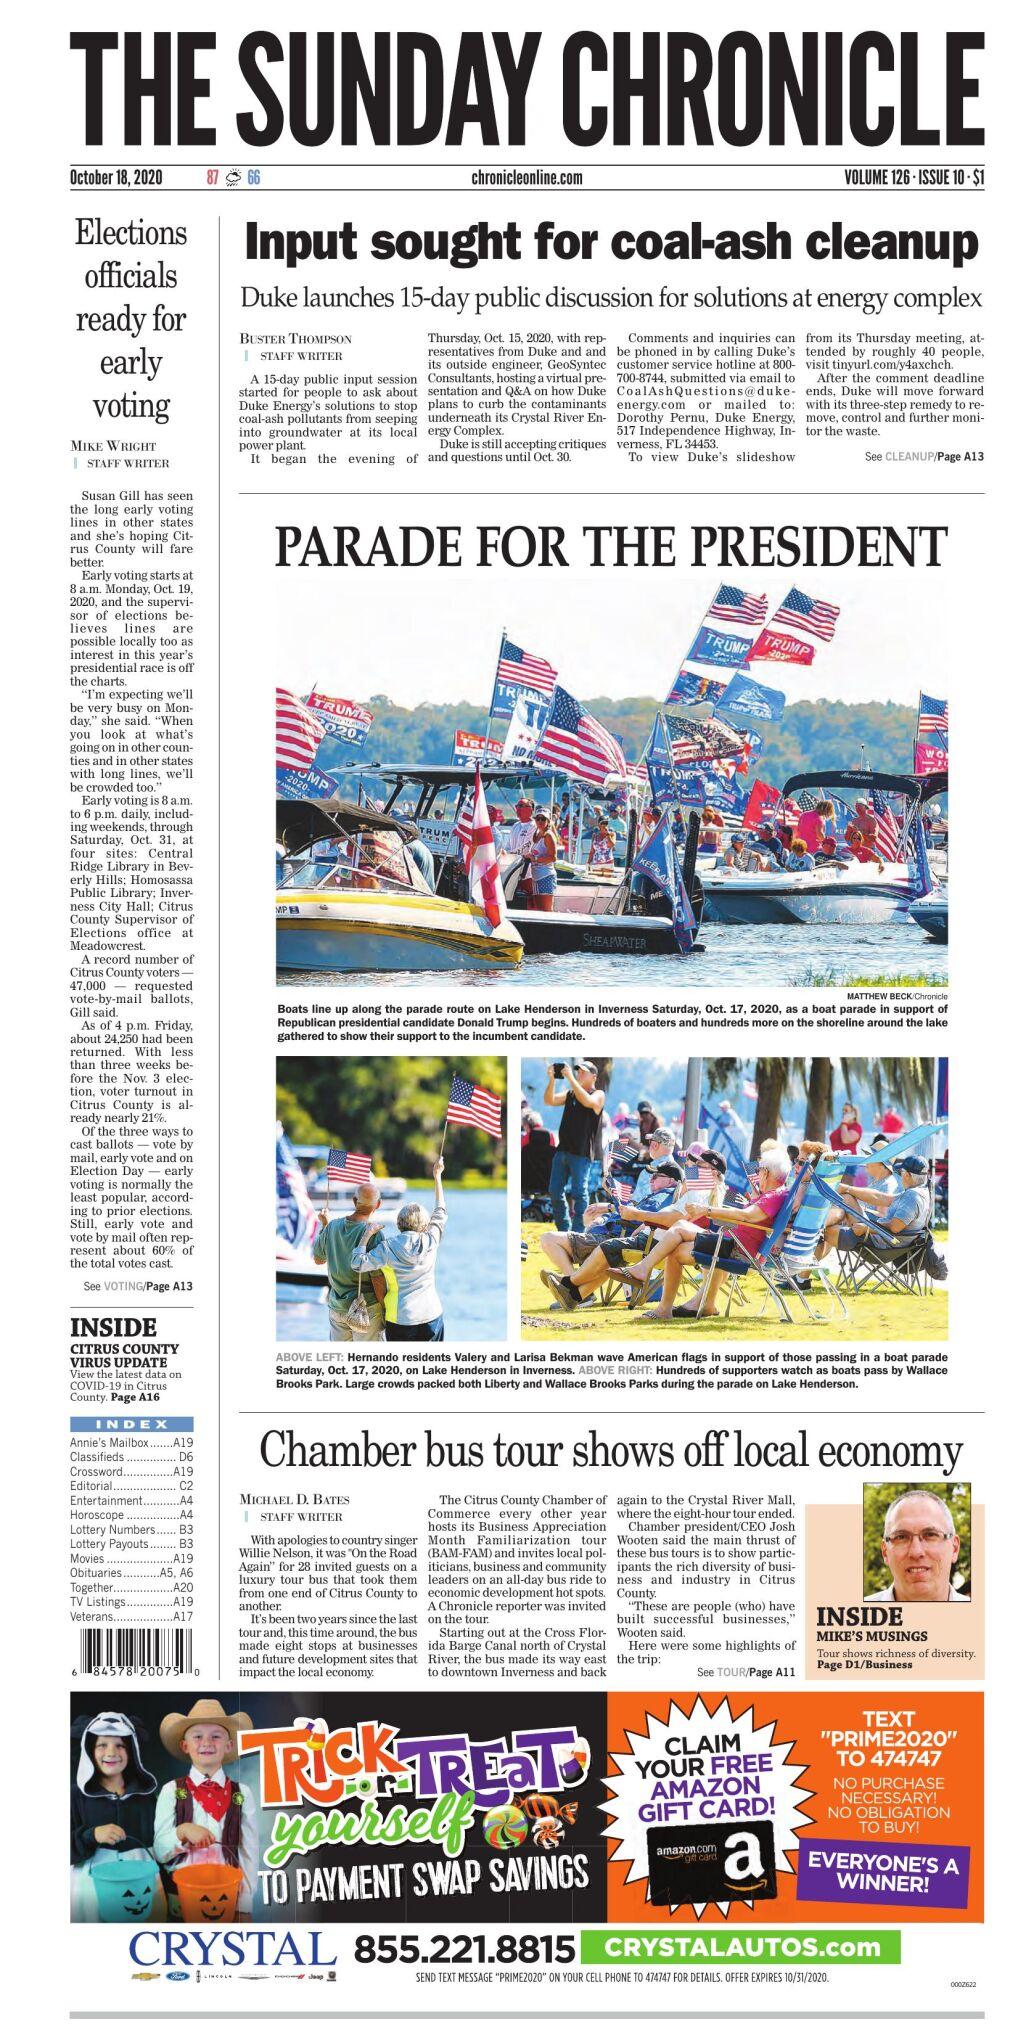 Christmas Show Citrus County Fl 2020 Citrus County Chronicle Oct 18, 2020 e edition | E edition